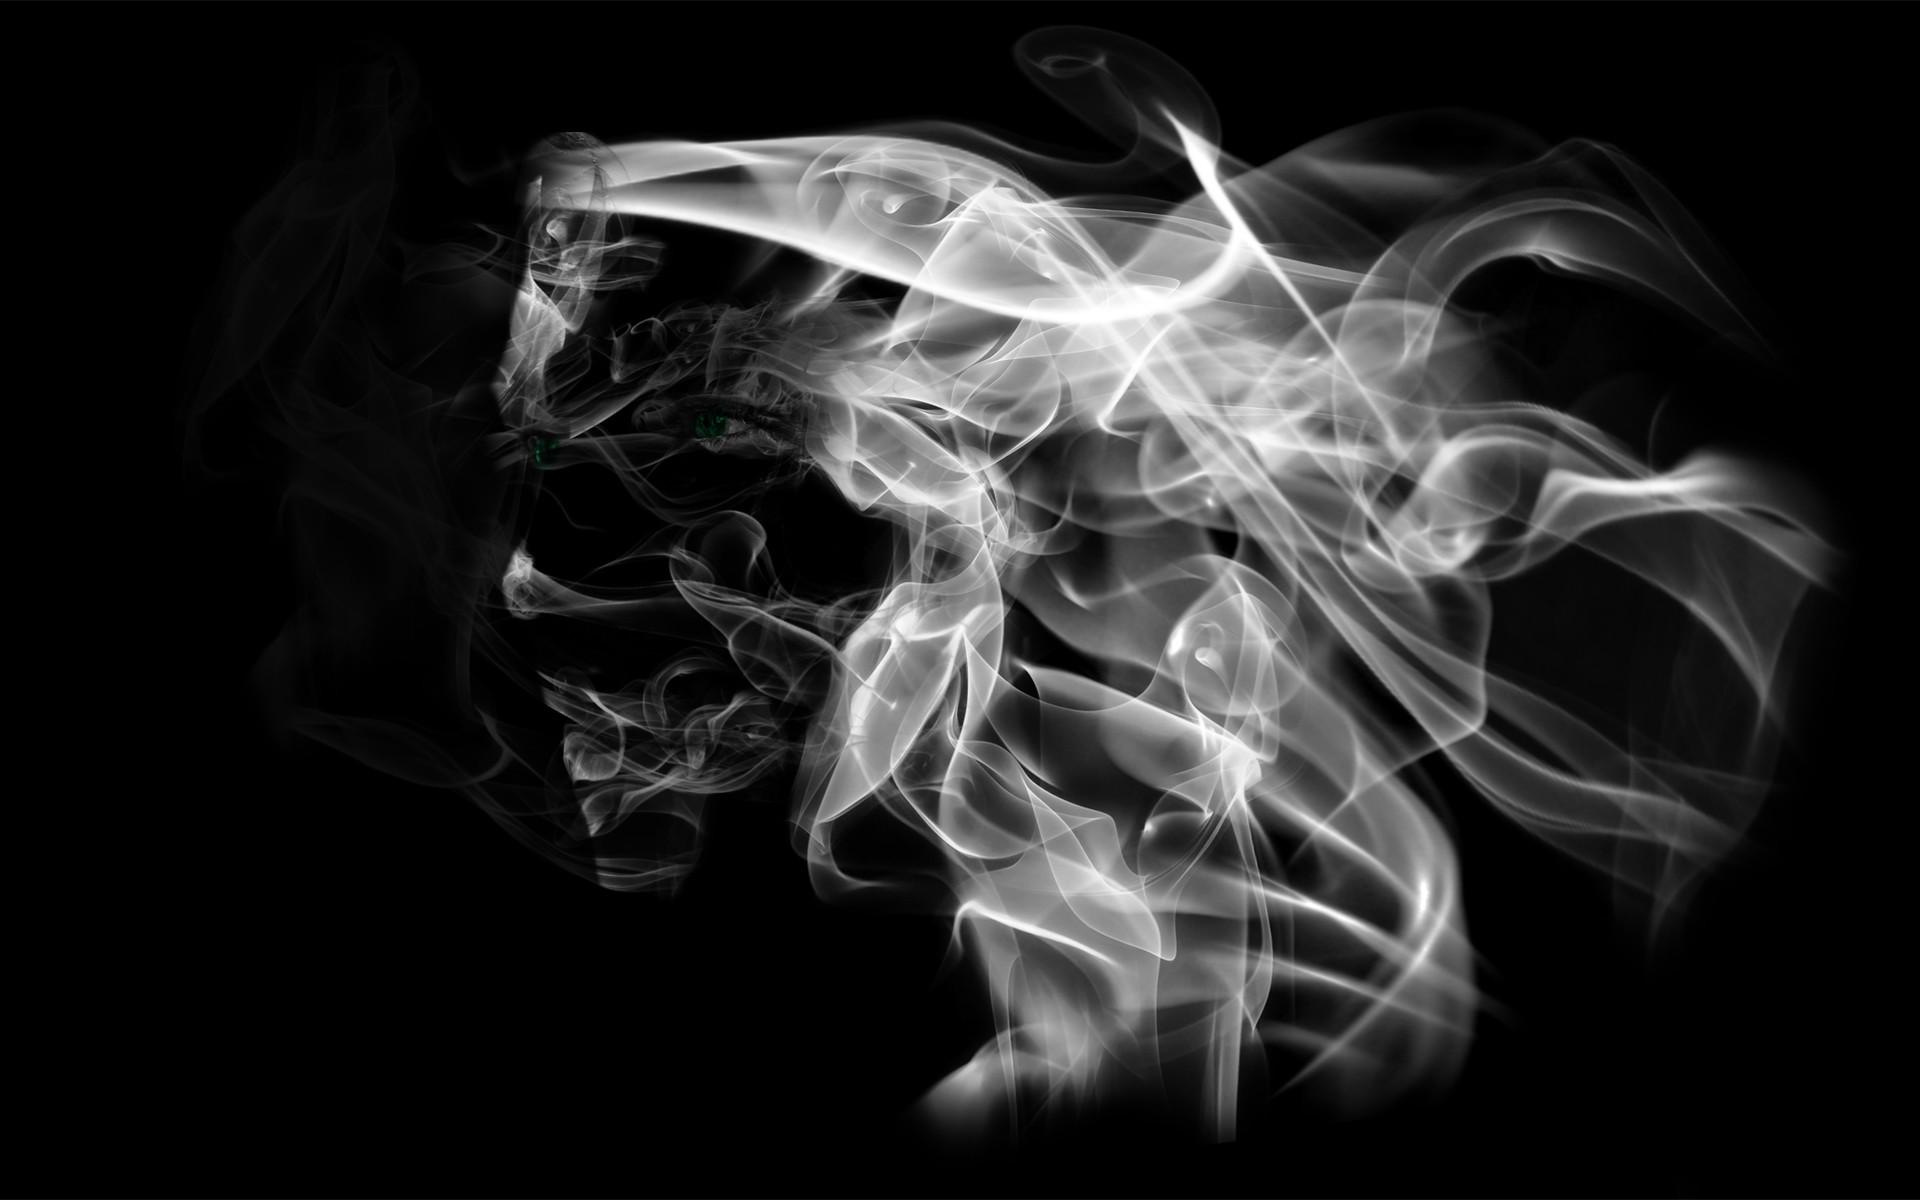 White Smoke Abstract Wallpaper HD #1032 Wallpaper | High Resolution .